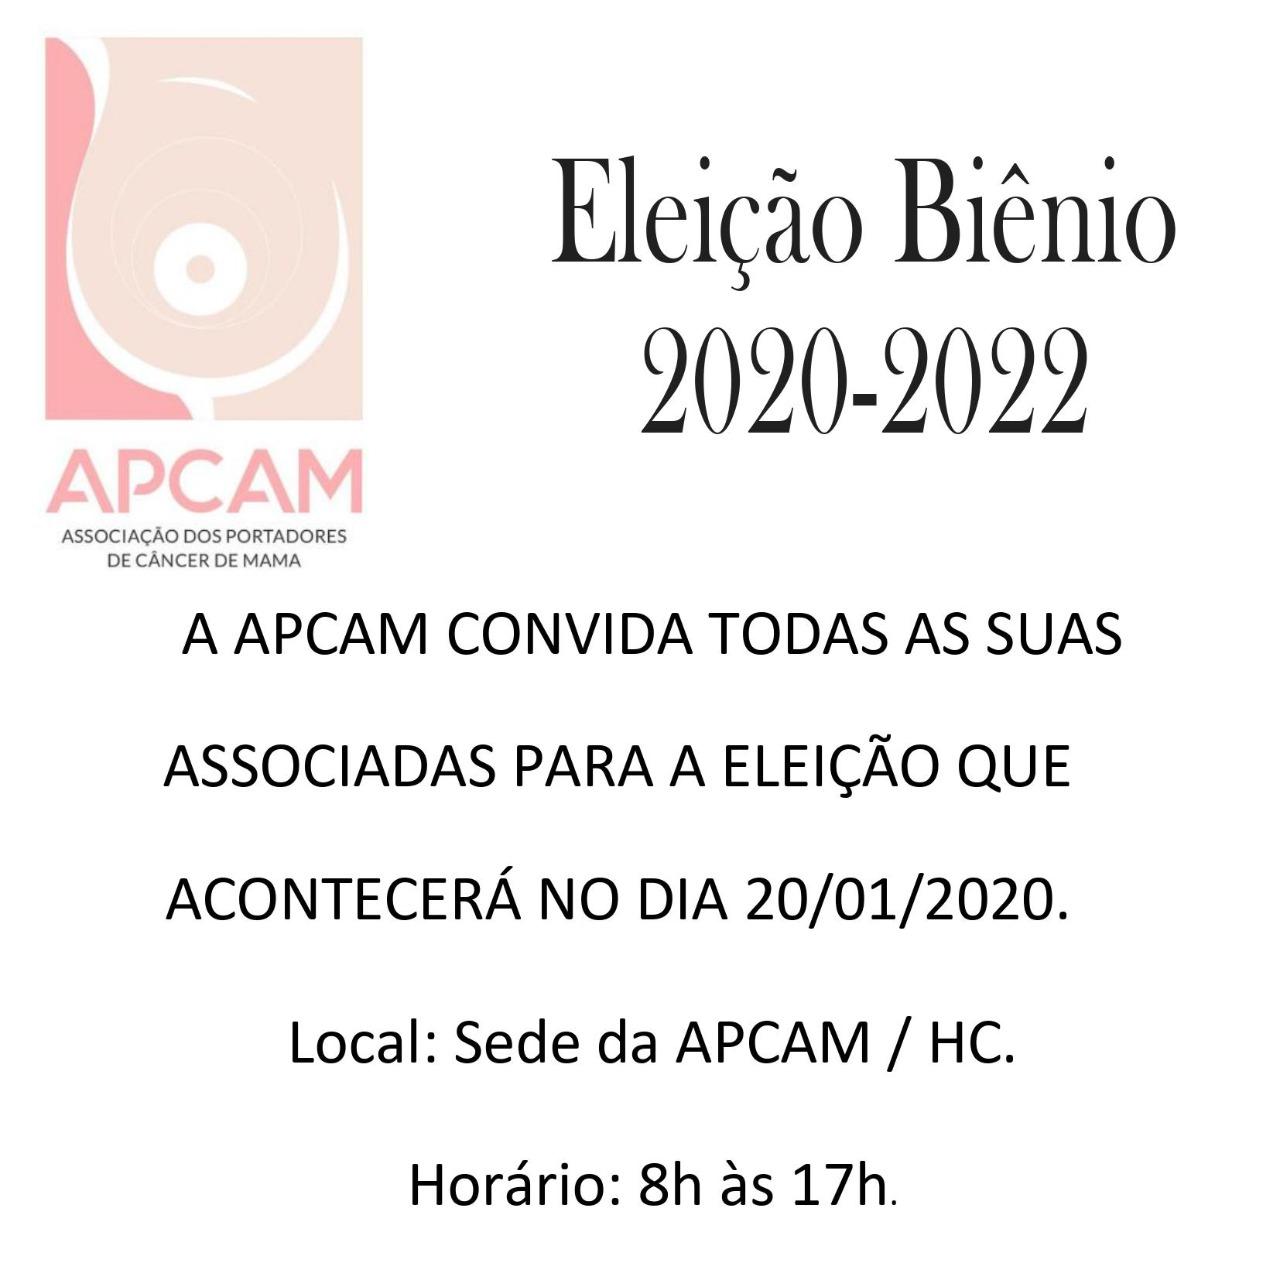 APCAM